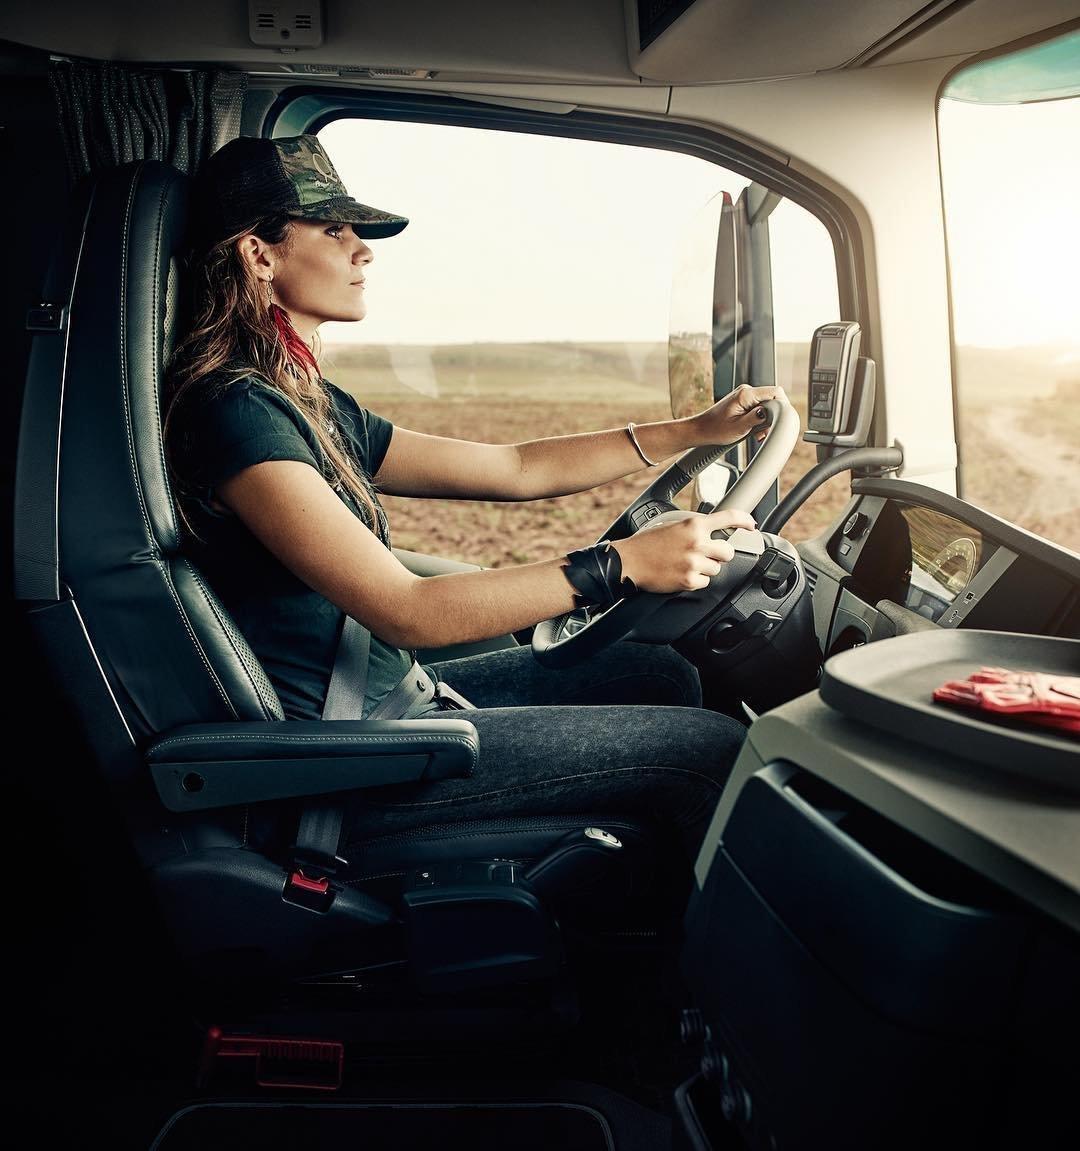 Картинки девушки водителя